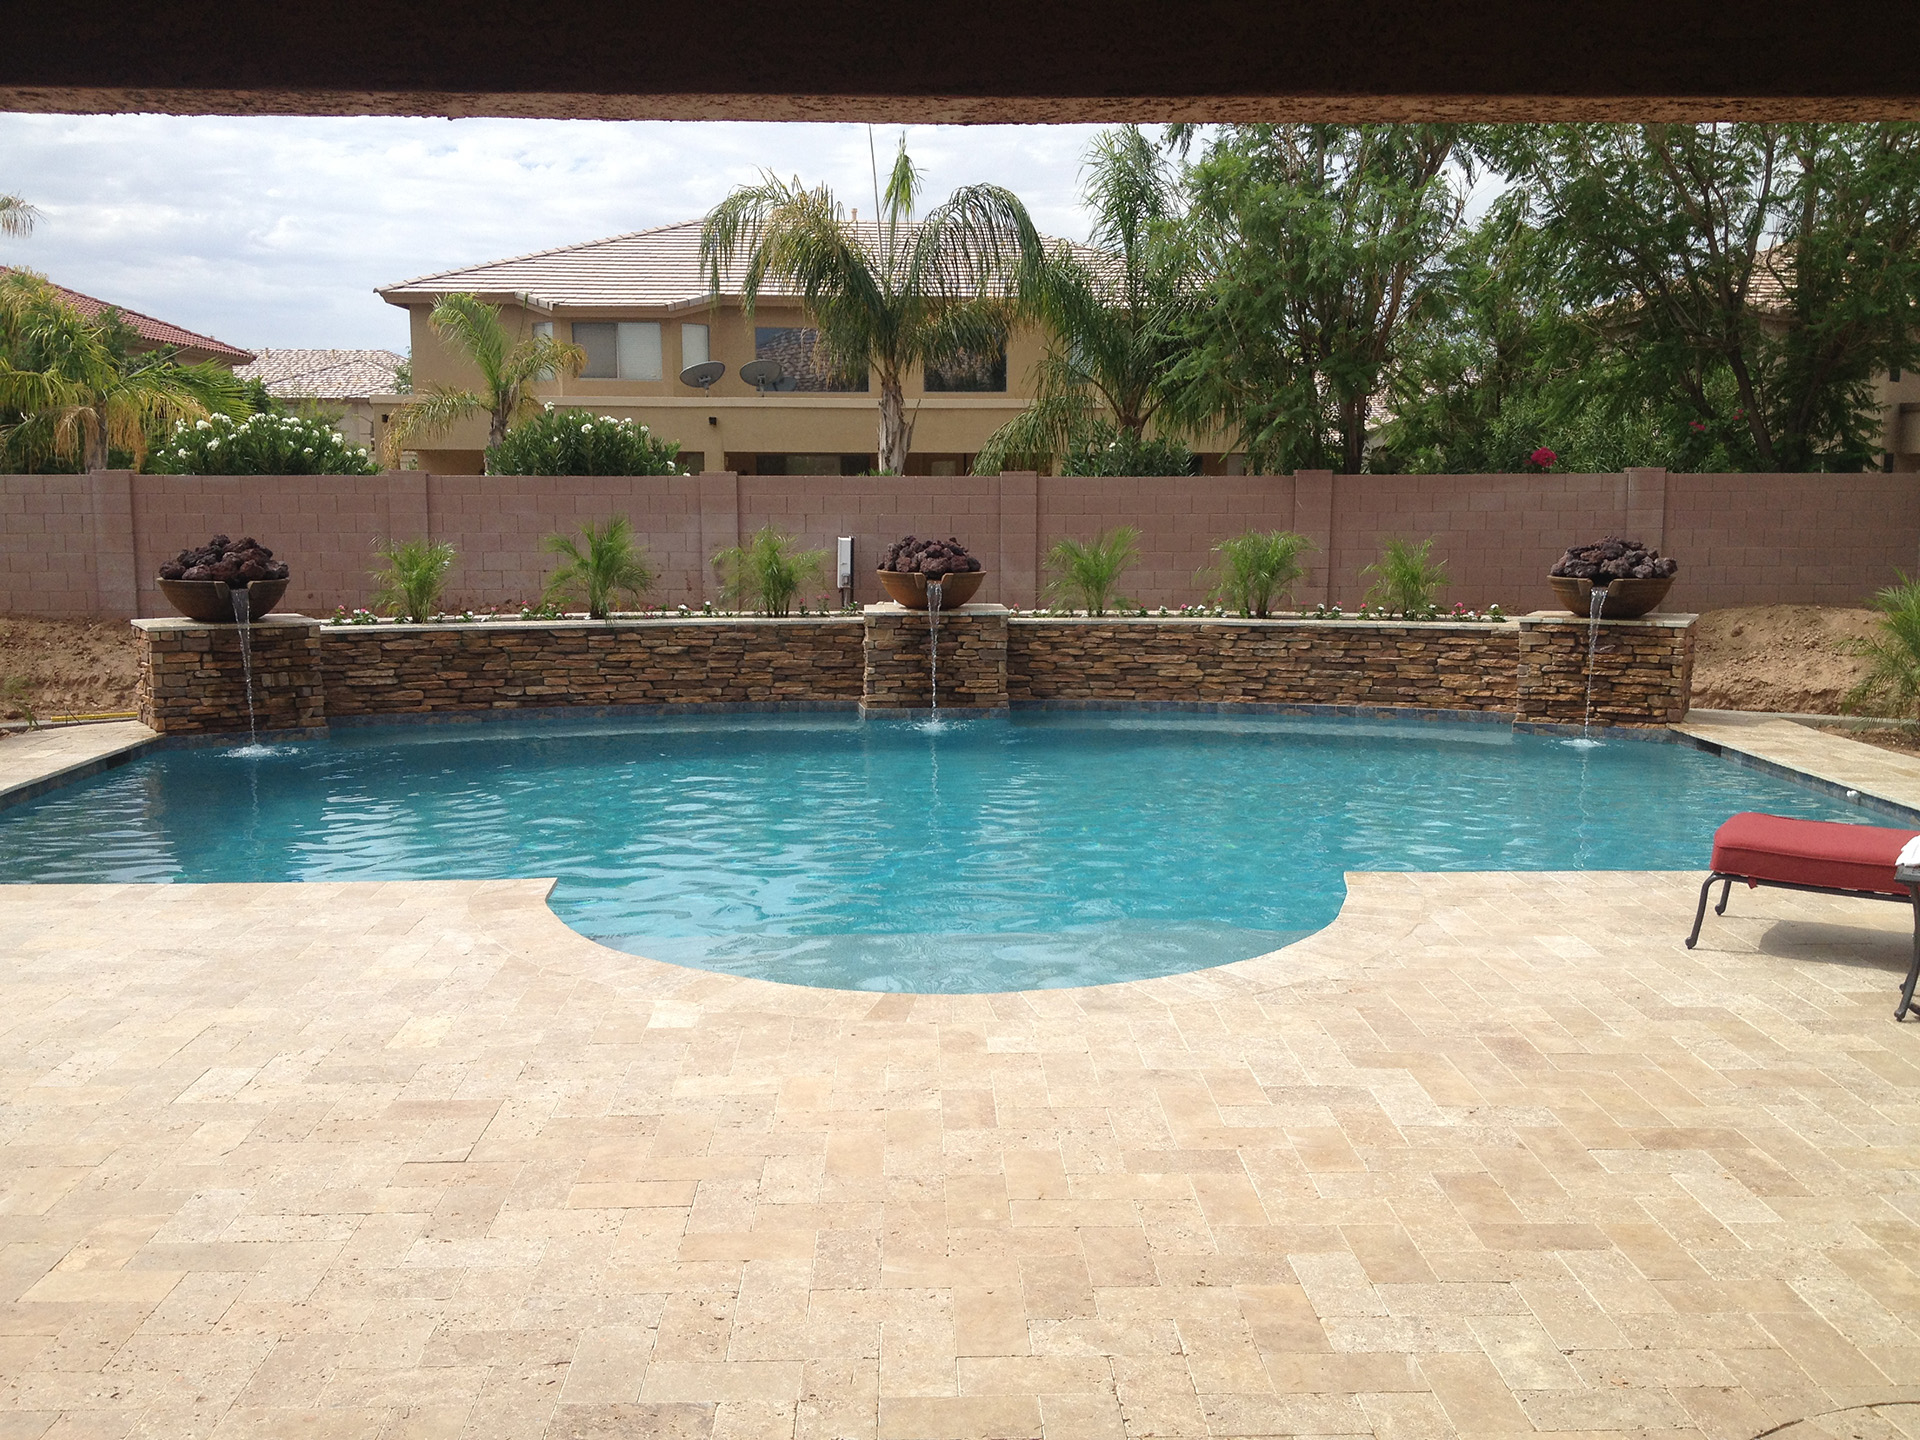 No Limit Pools & Spas image 59